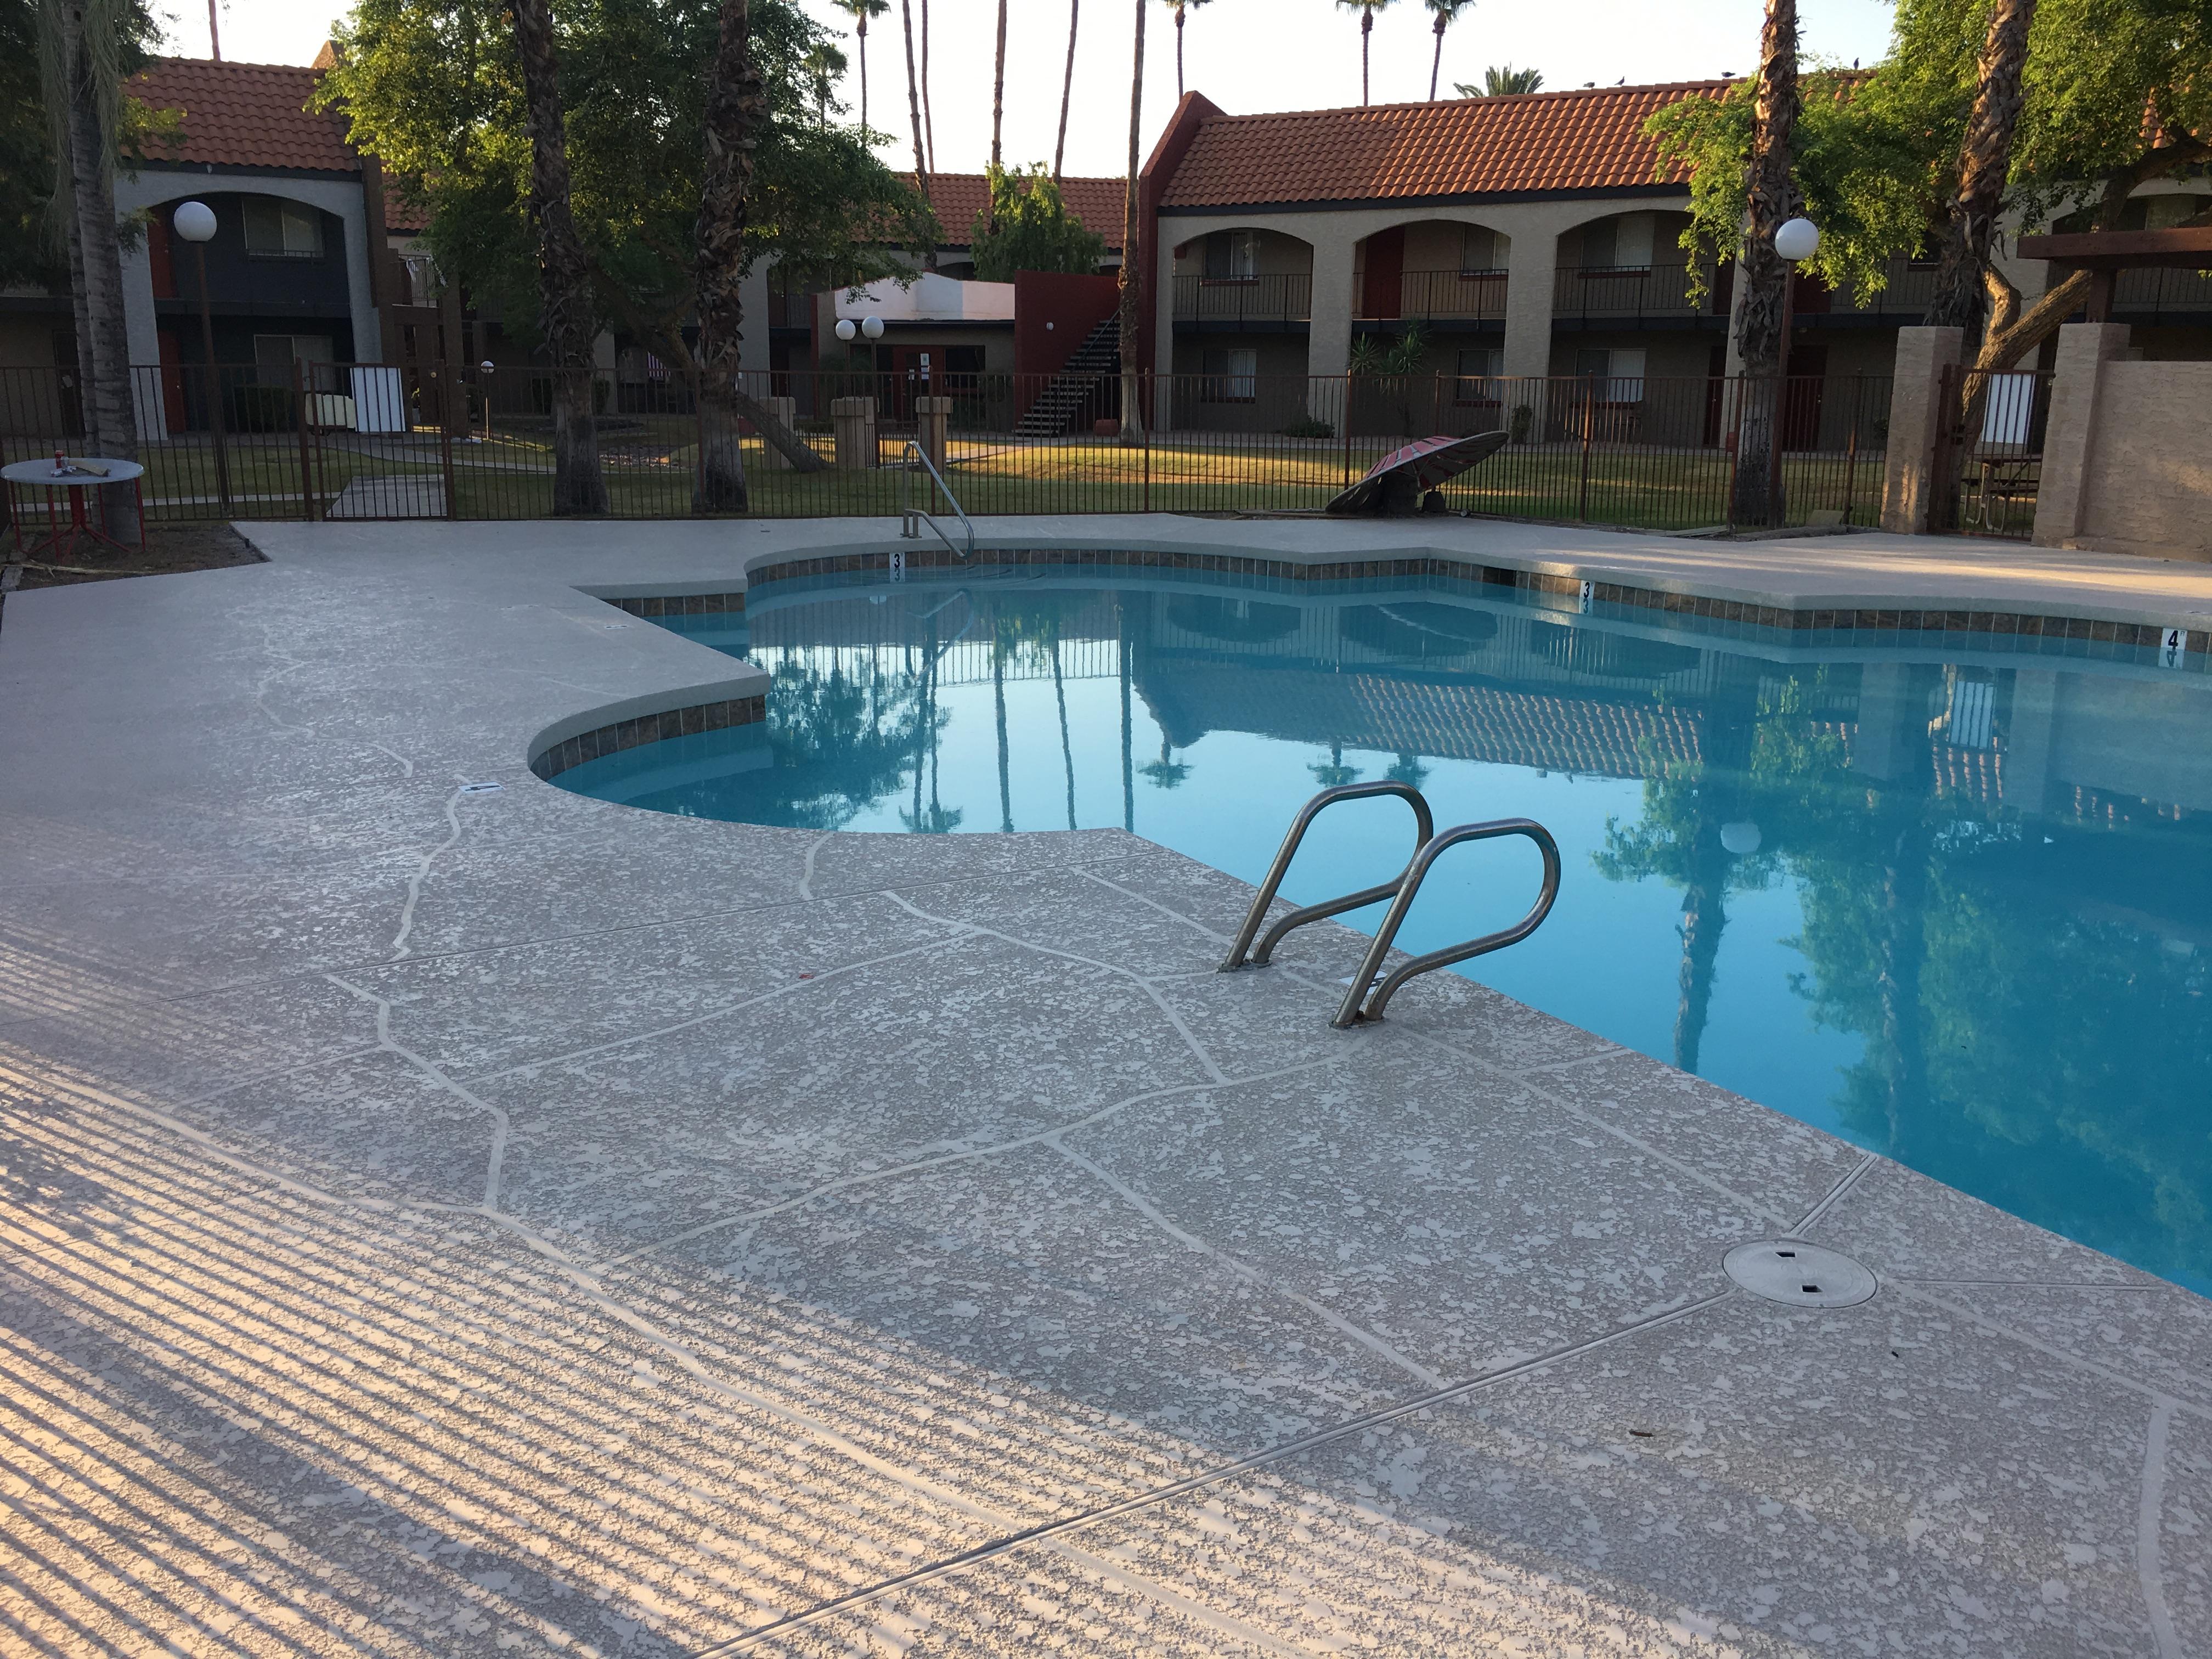 Commercial Pool Deck - Deck Resurfacing - Cool Deck (6) - Arrowhead ...